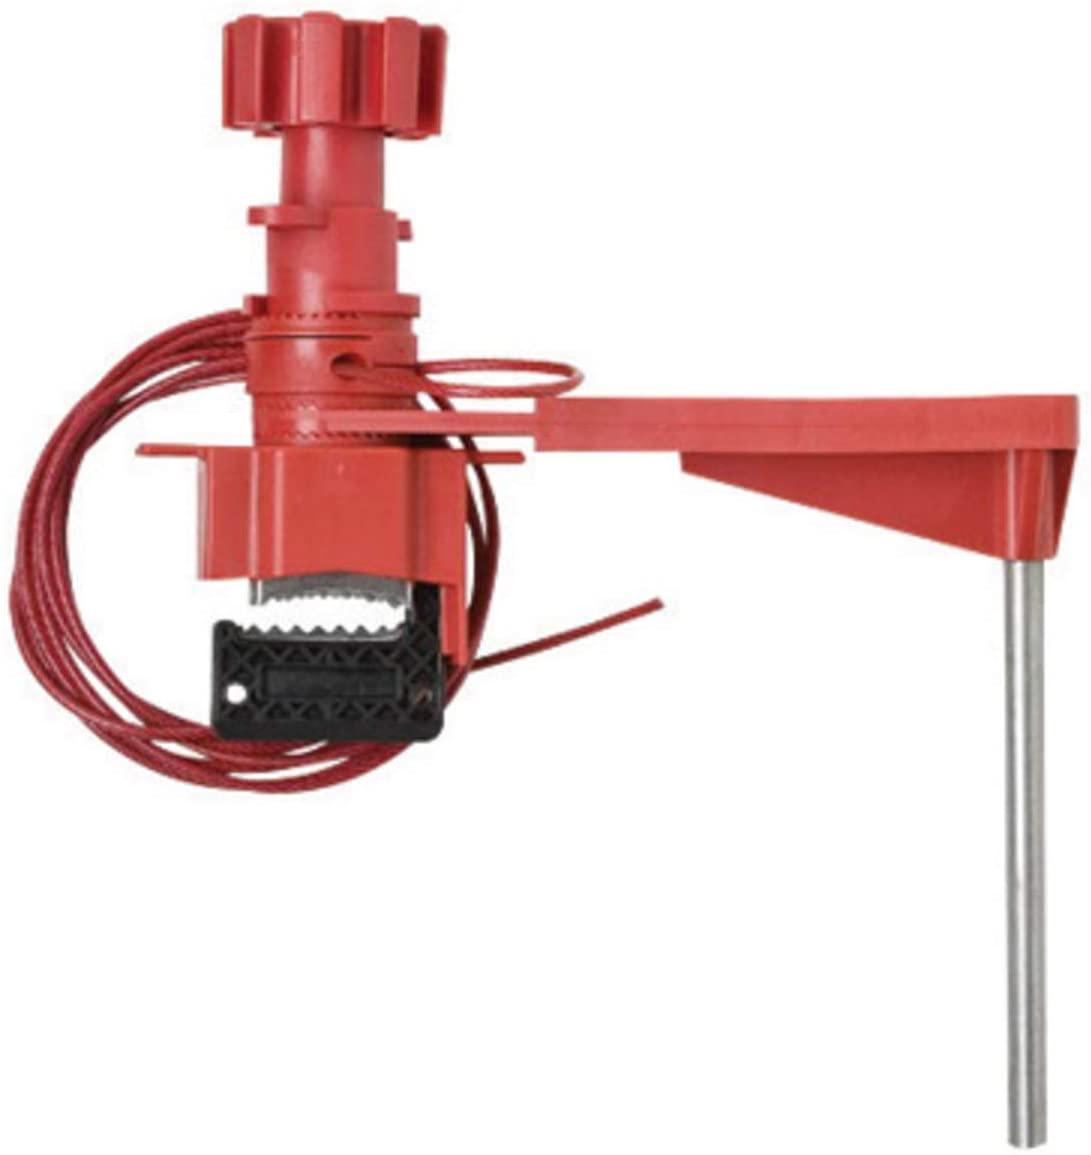 Brady Red Reinforced Brass/Fiberglass/Nylon/Stainless Steel Lockout